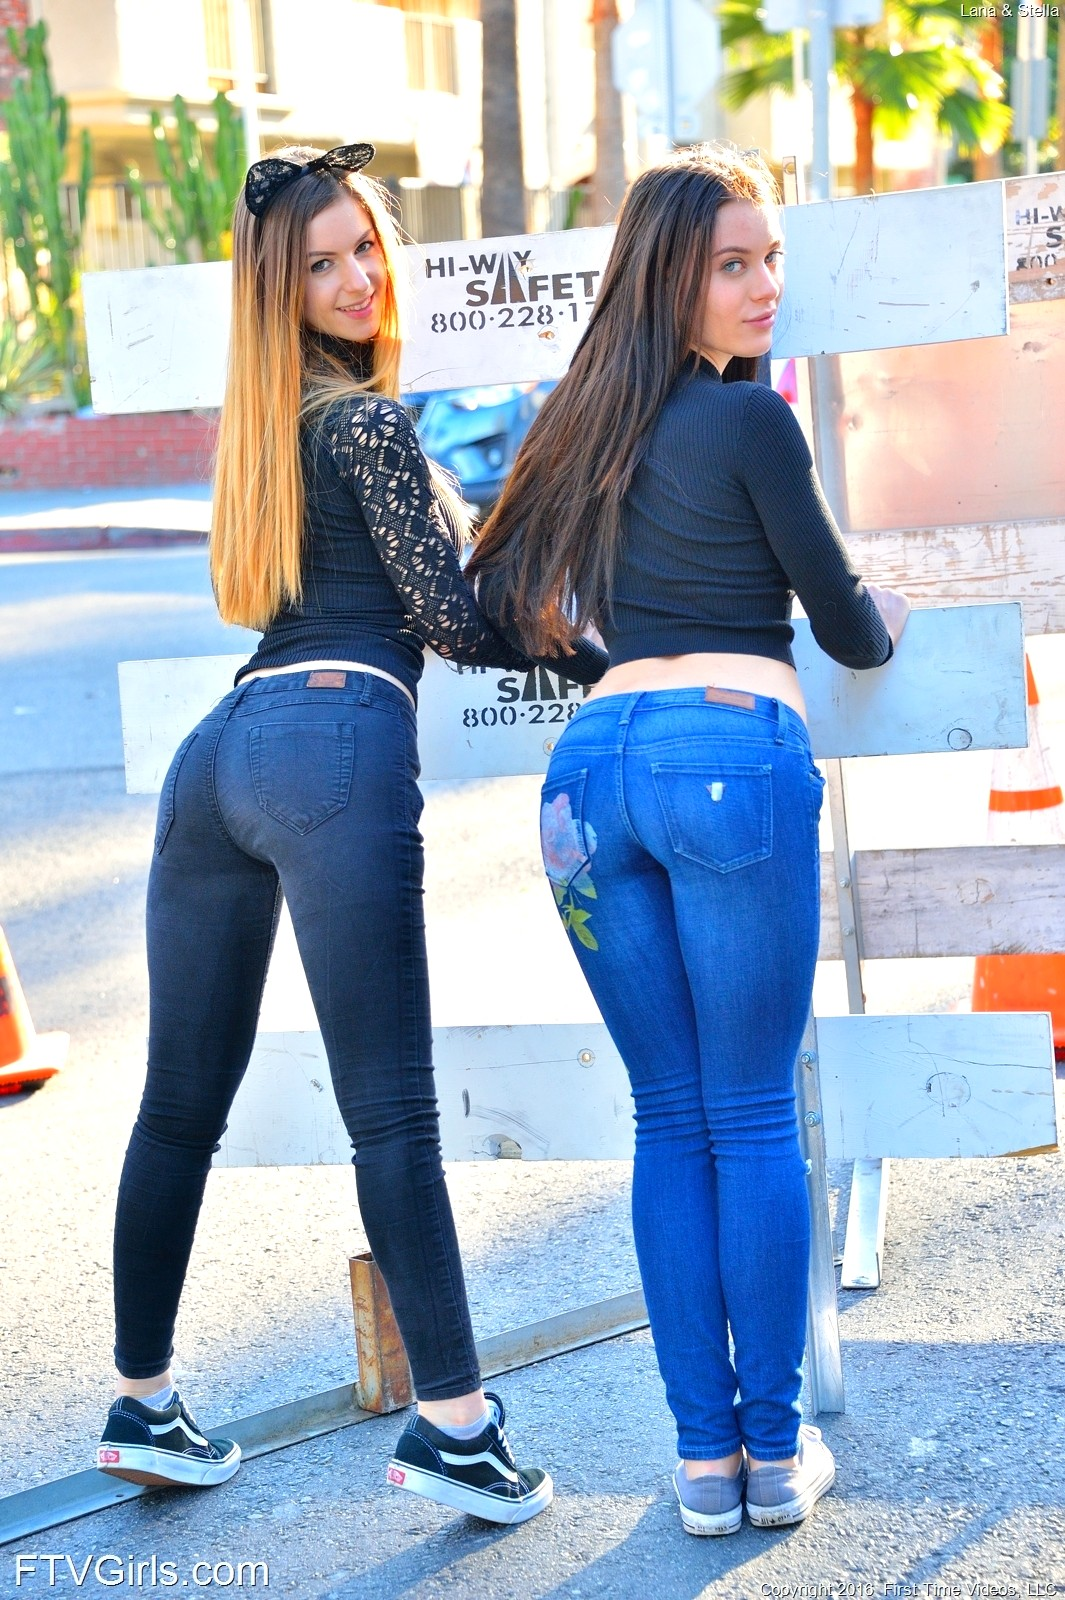 Ftv girls peeing